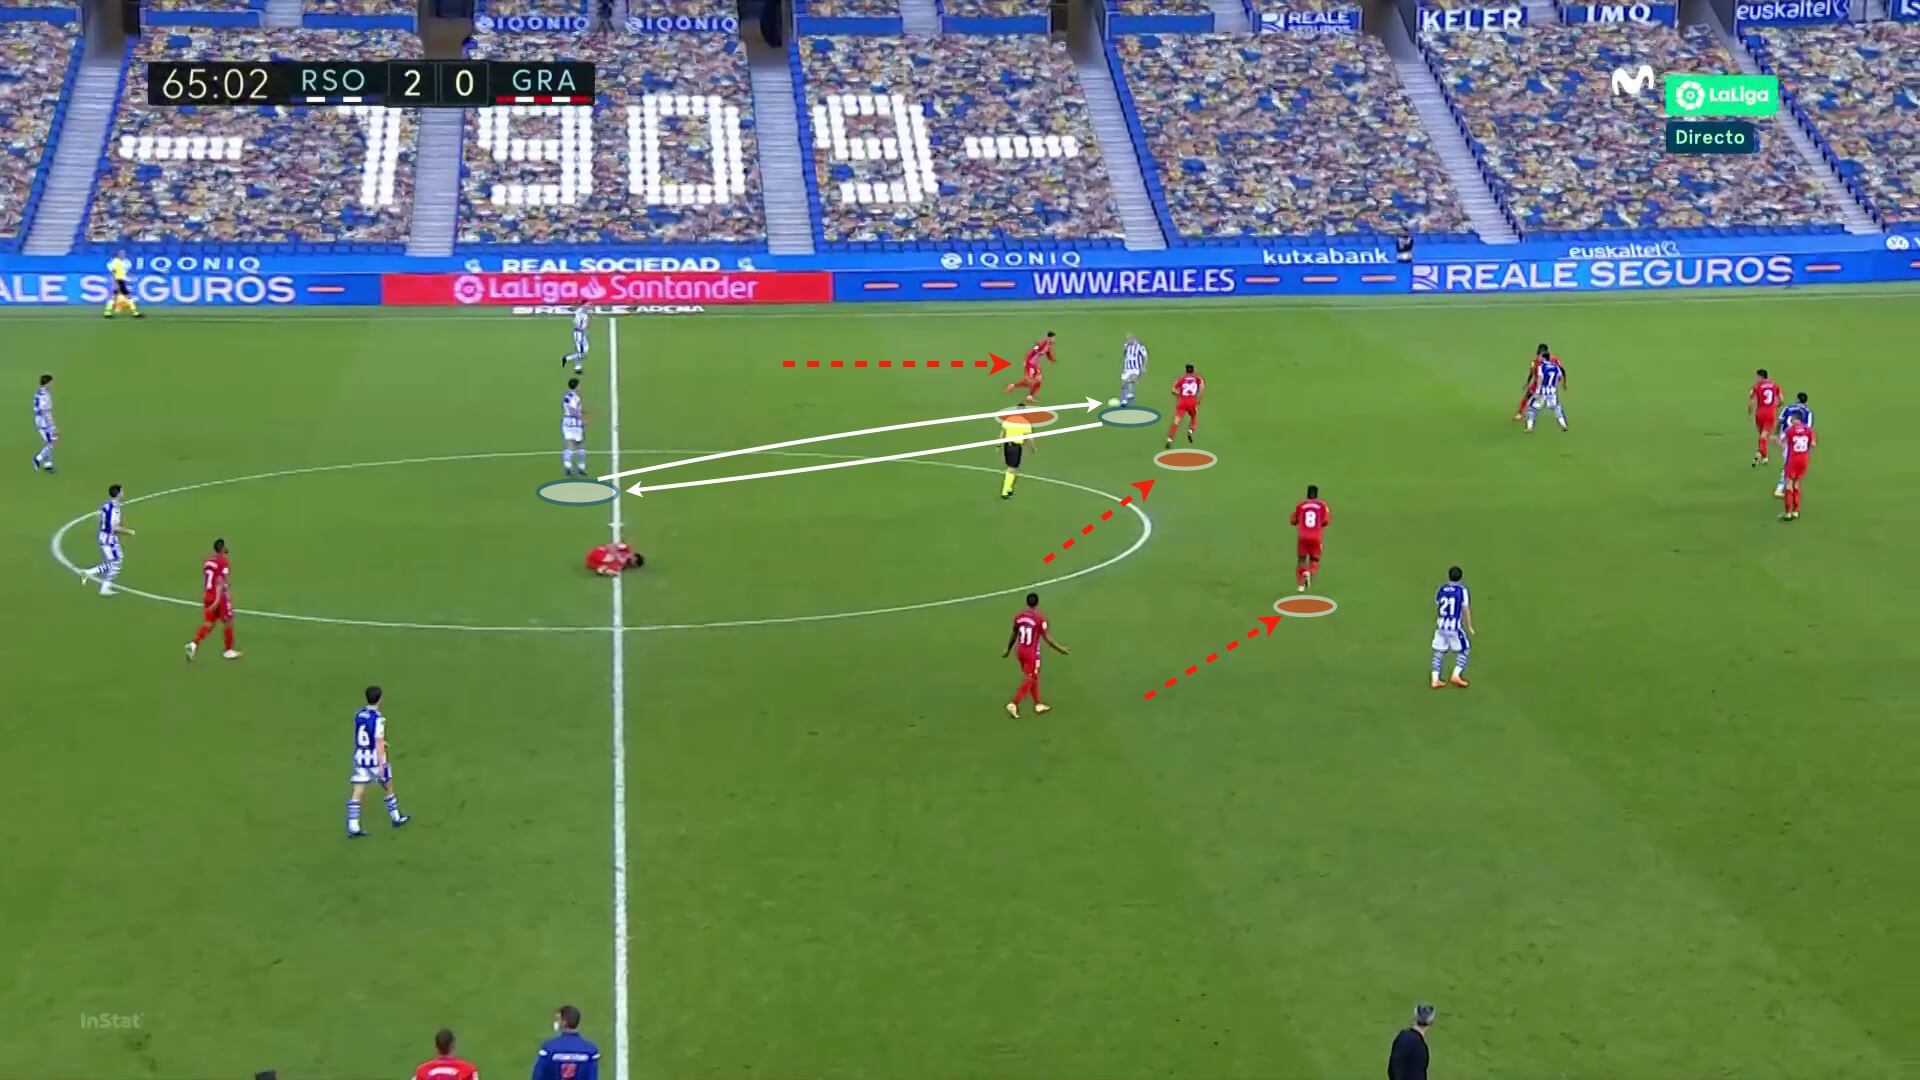 Martin Zubimendi 2020/21 - scout report tactical analysis tactics